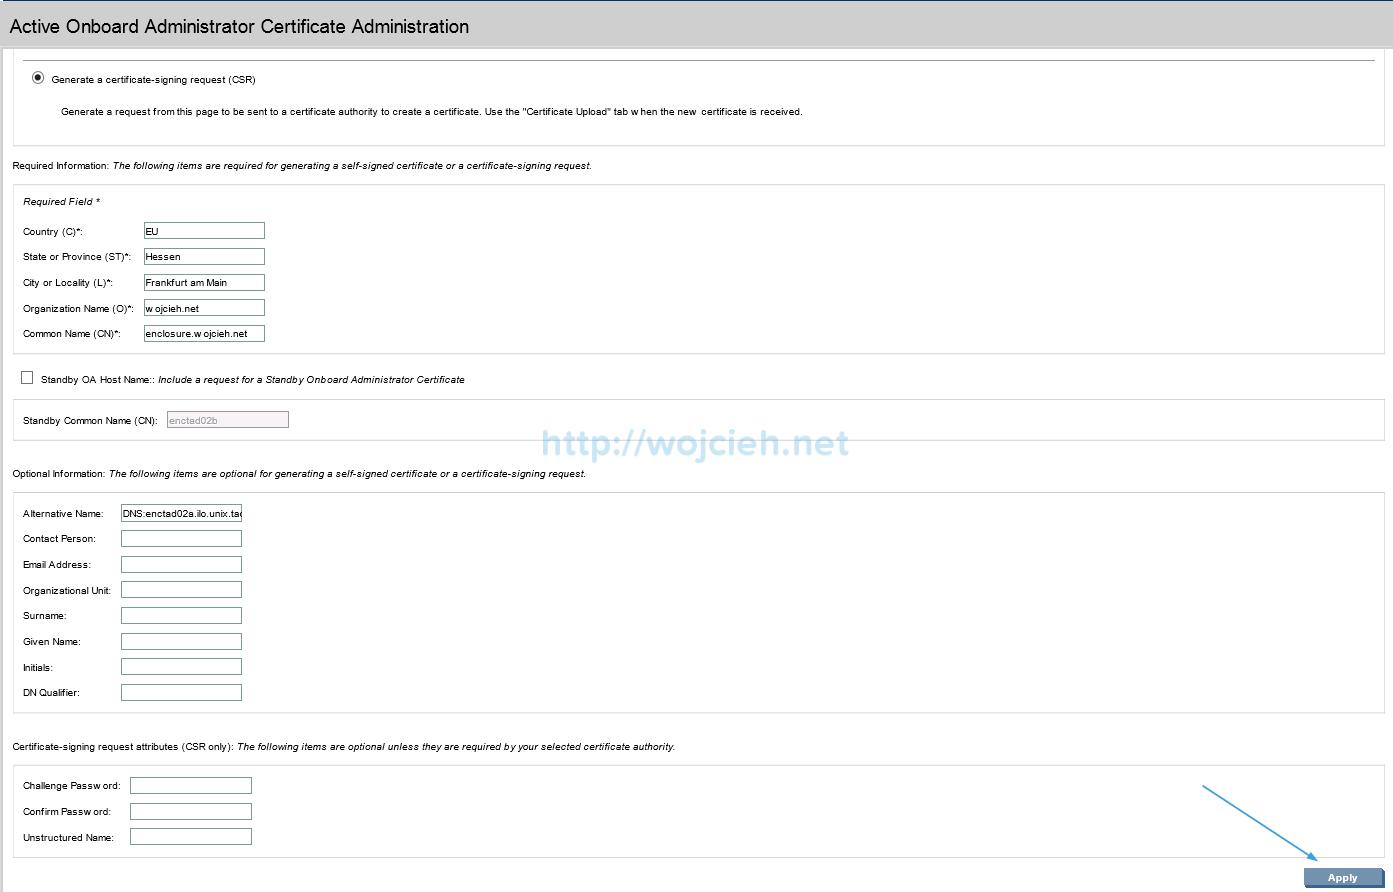 Installing signed SSL certificates in HP c7000 enclosure - 3